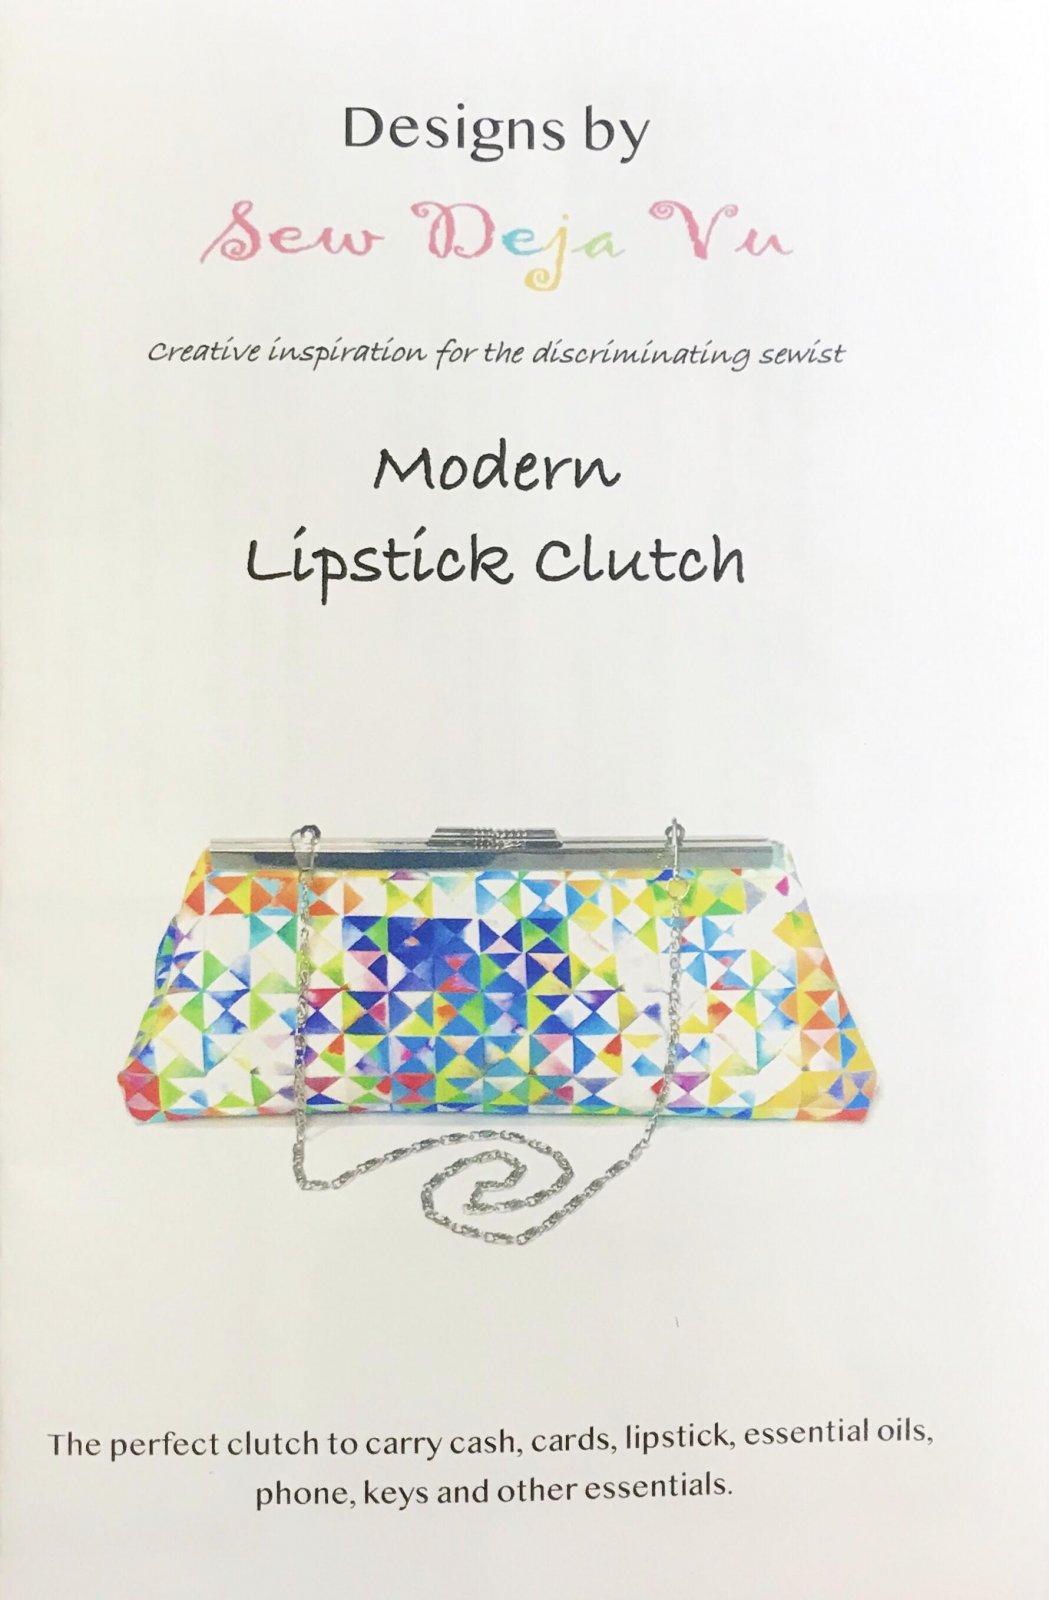 Modern Lipstick Clutch Pattern by Sew Deja Vu